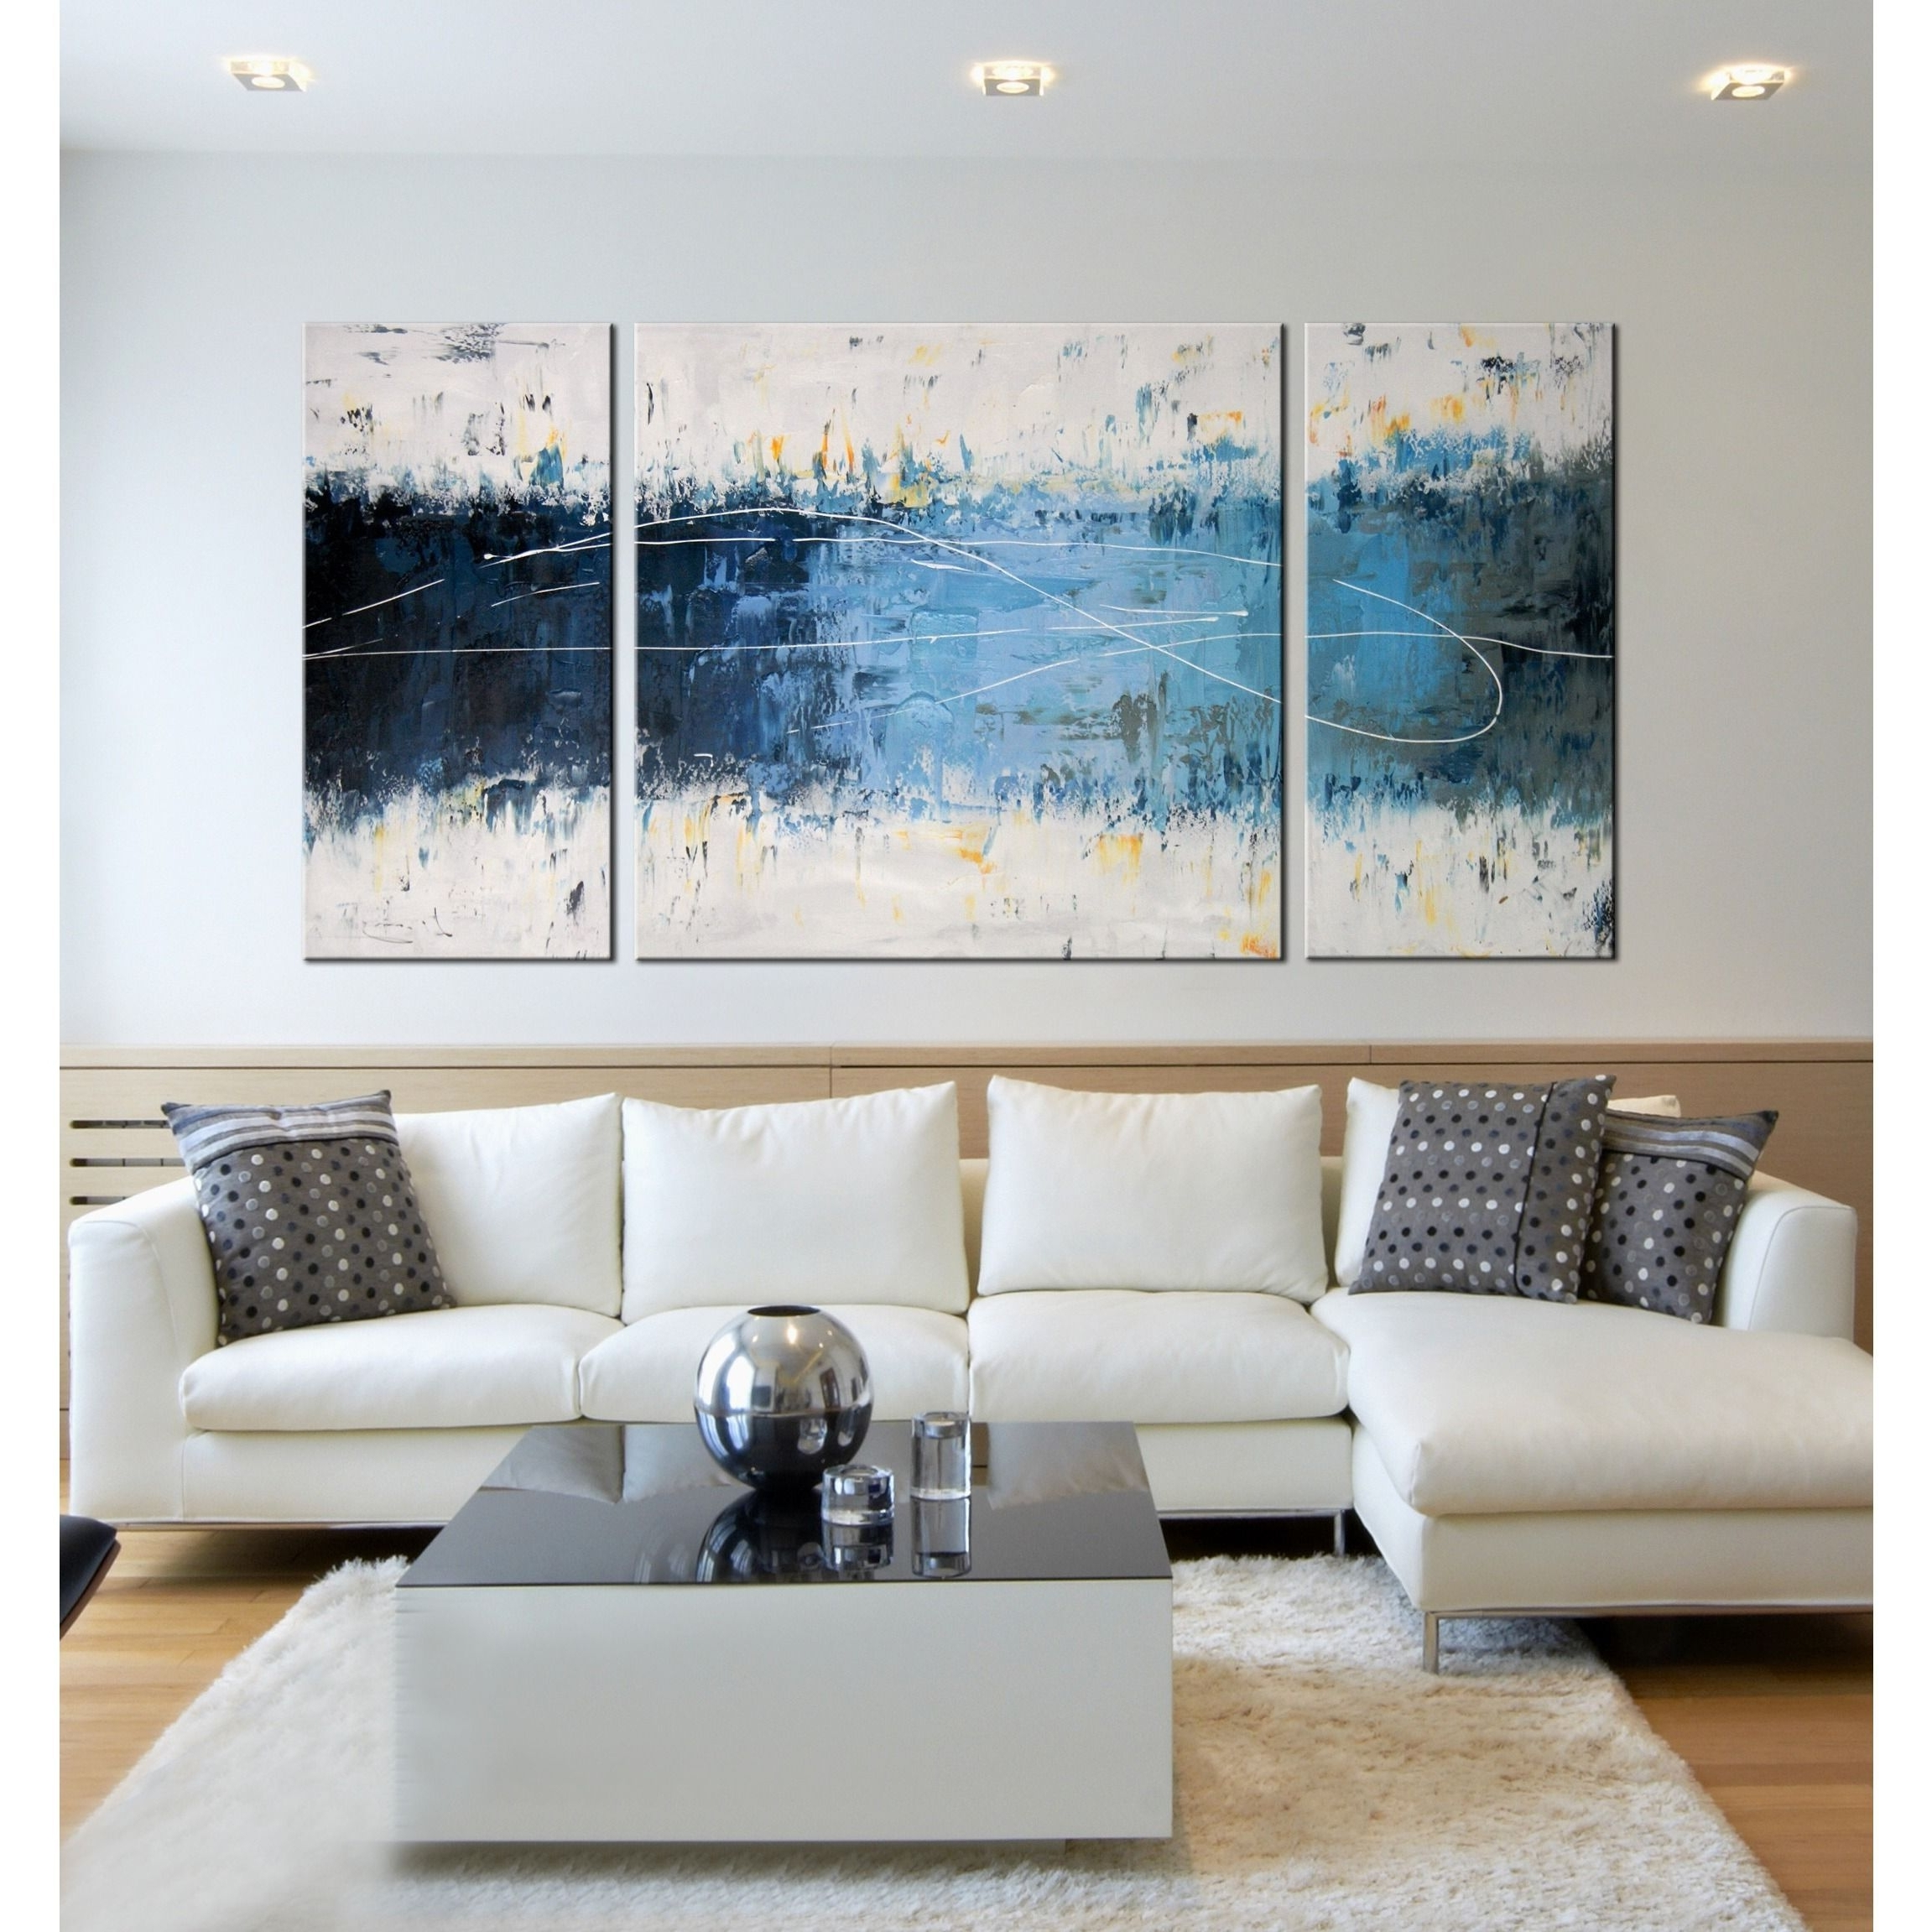 Abstract Canvas Wall Art Iii With Regard To Best And Newest Li>Artist: Unknown</li> <Li>Title: Wake Up</li> <Li>Product Type (View 8 of 15)